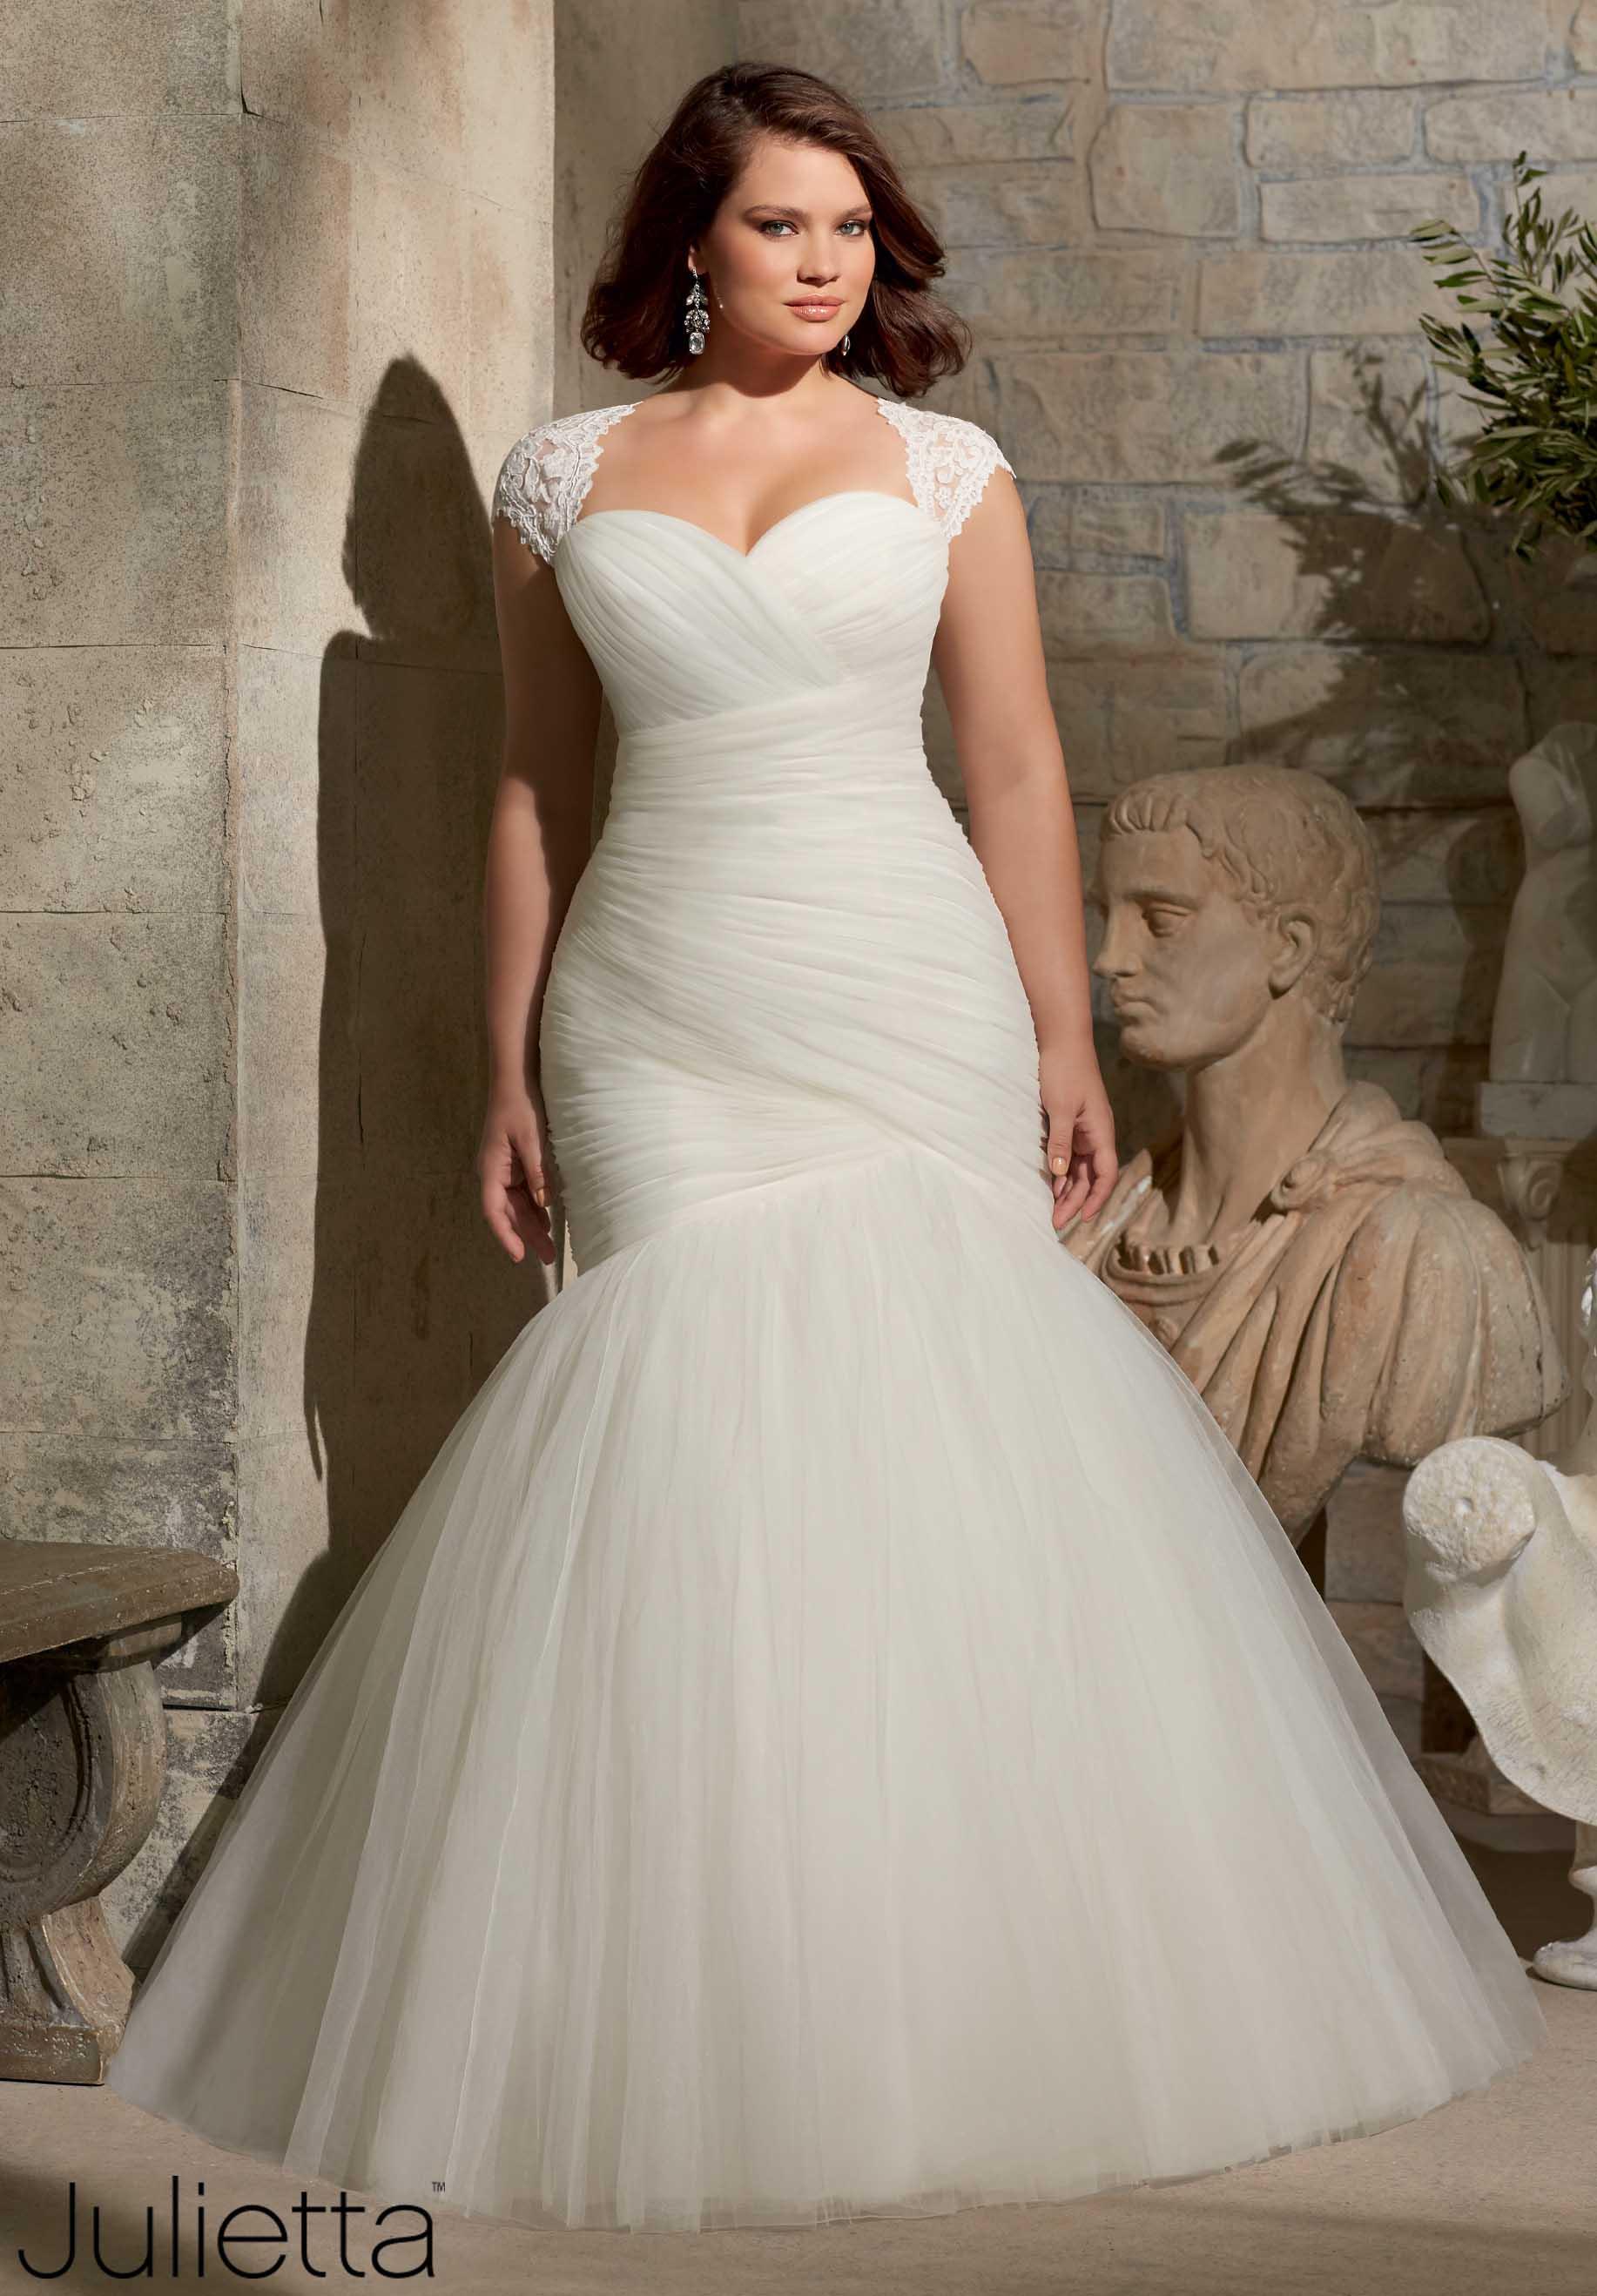 best wedding dresses for plus size photo - 1